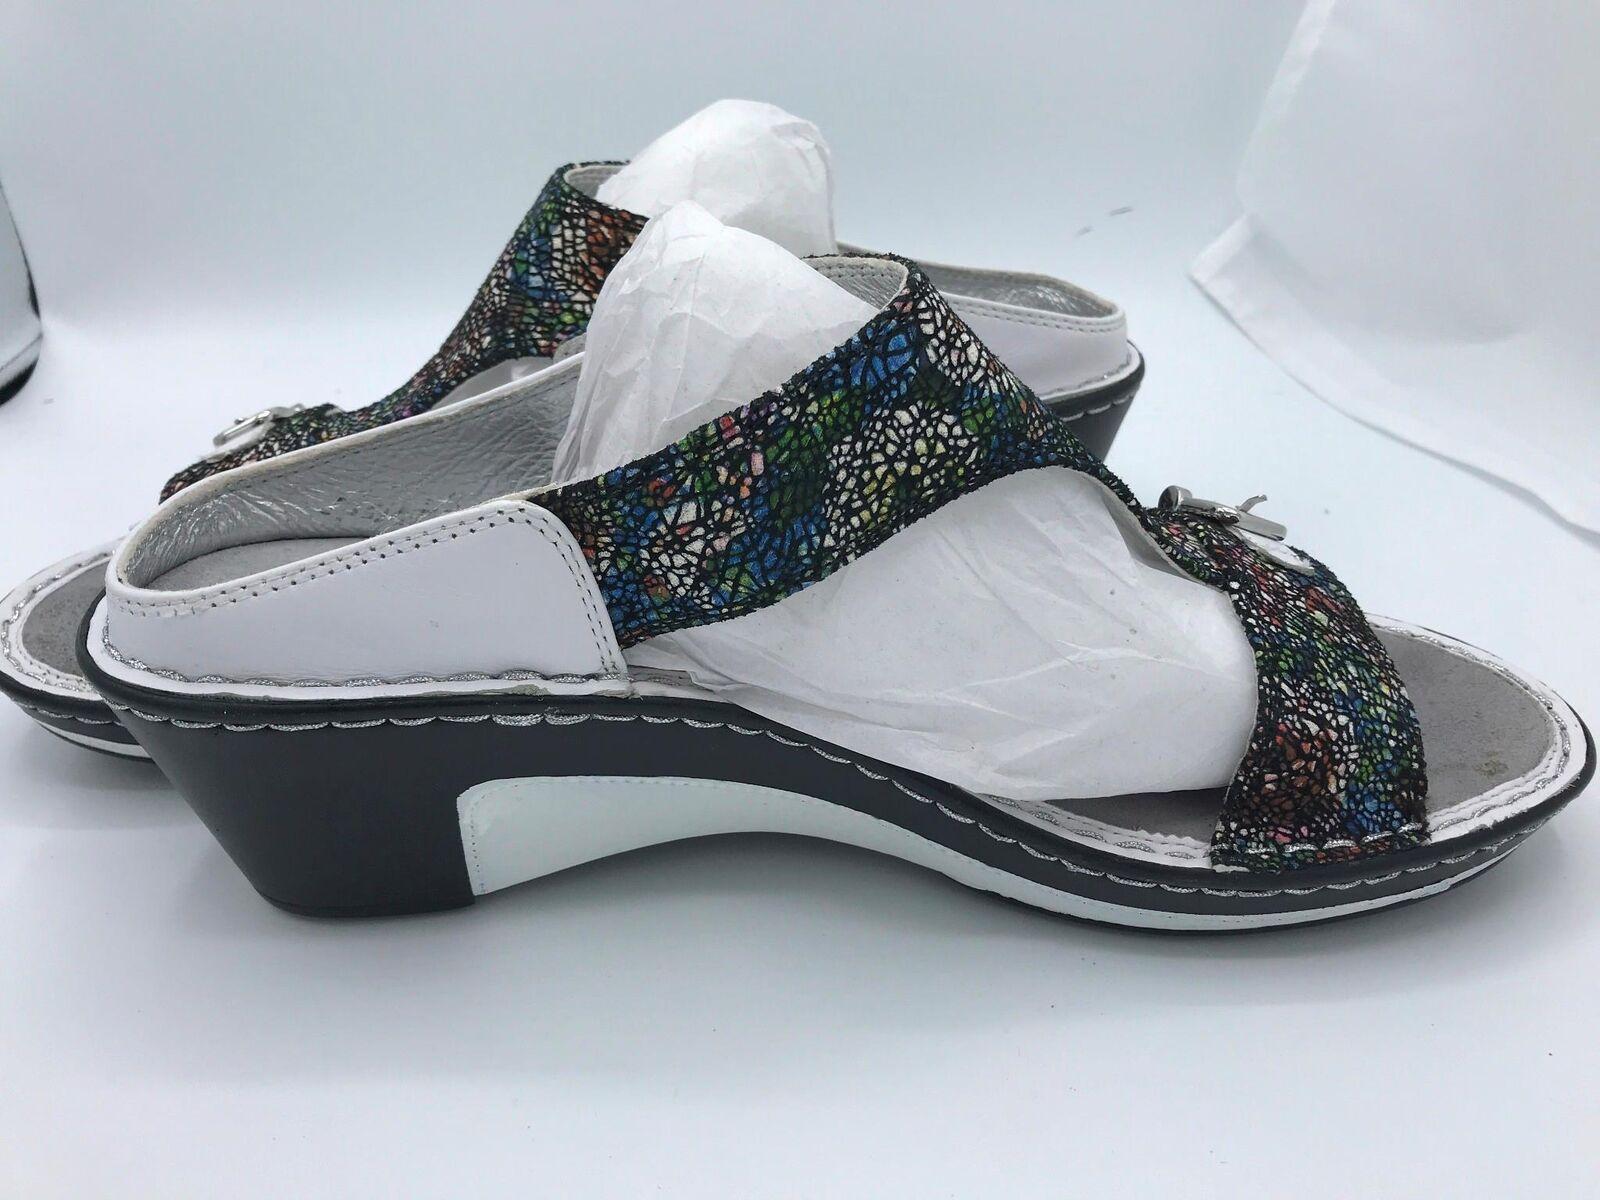 Alegria Leather Slip-on Sandals Lara 42, Cathedral (1585) Multicolor Eur 42, Lara US 11 7252ee